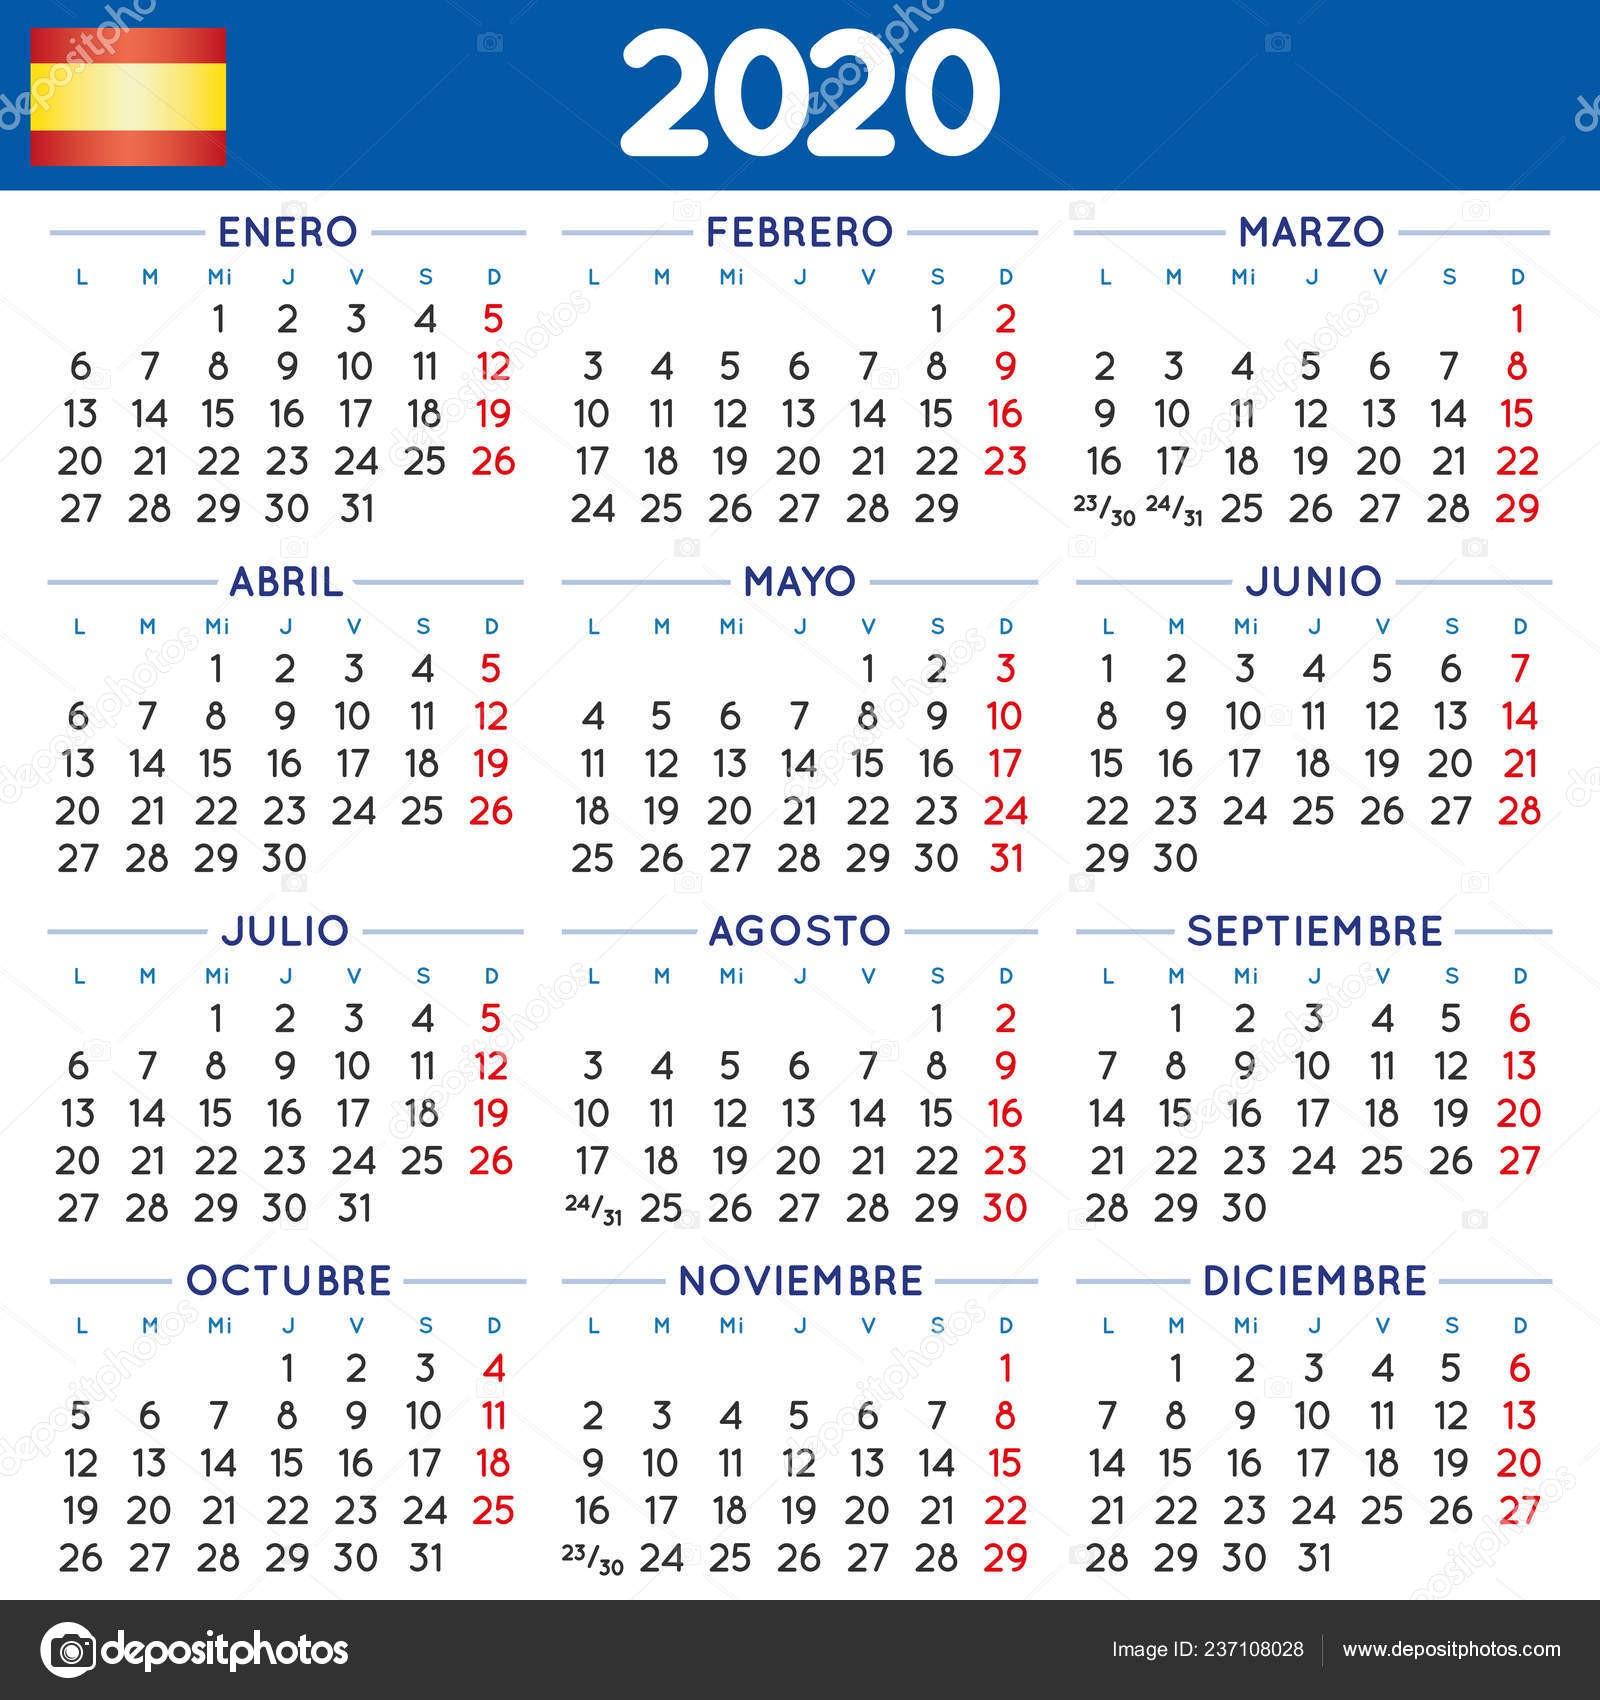 depositphotos stock illustration 2020 elegant squared calendar spanish